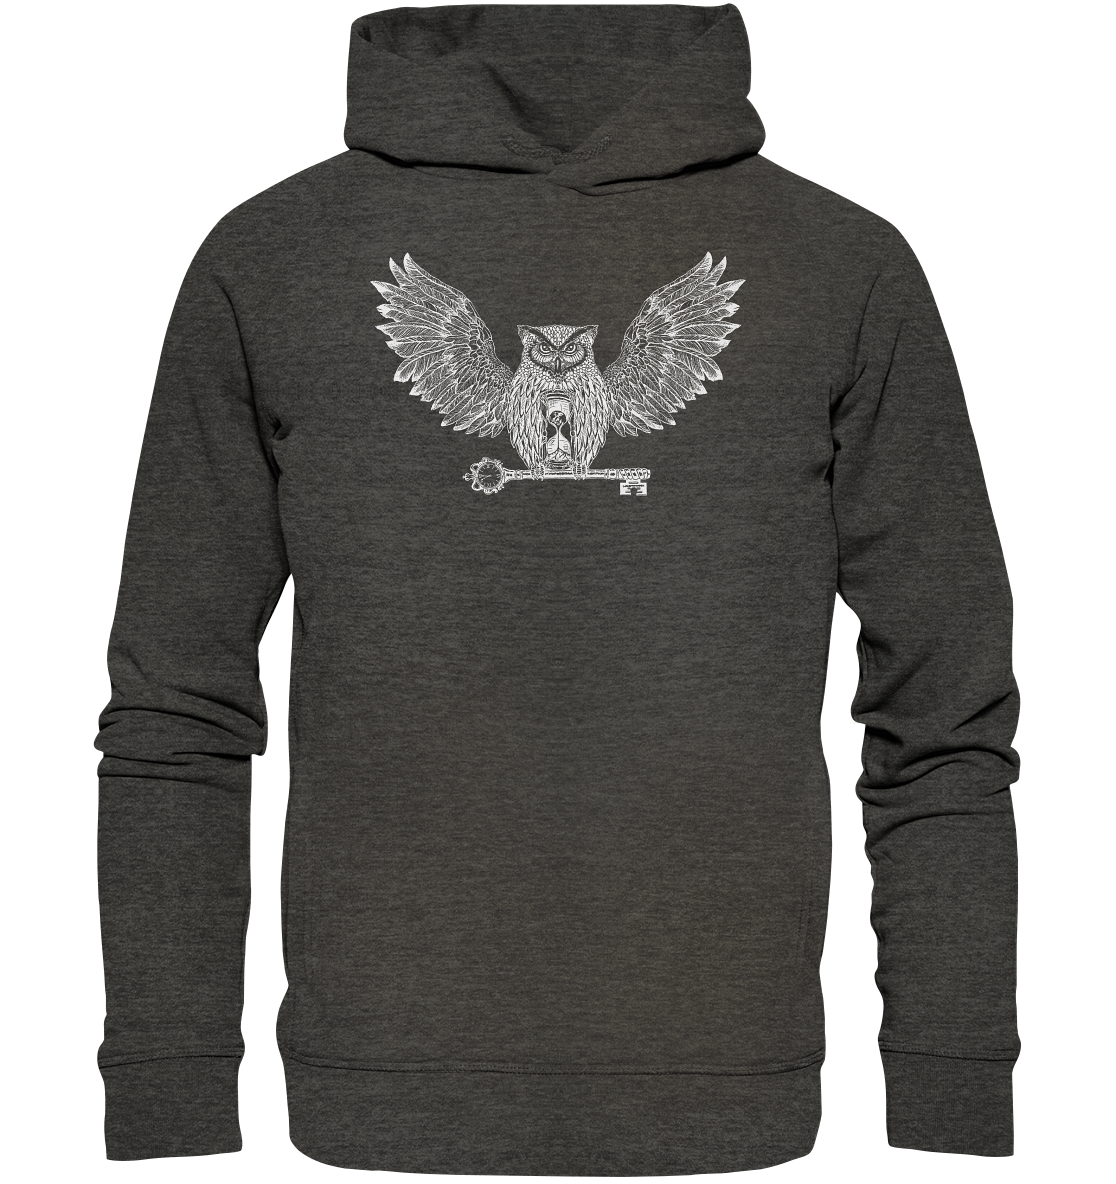 front-organic-fashion-hoodie-252625-1116x-4.png